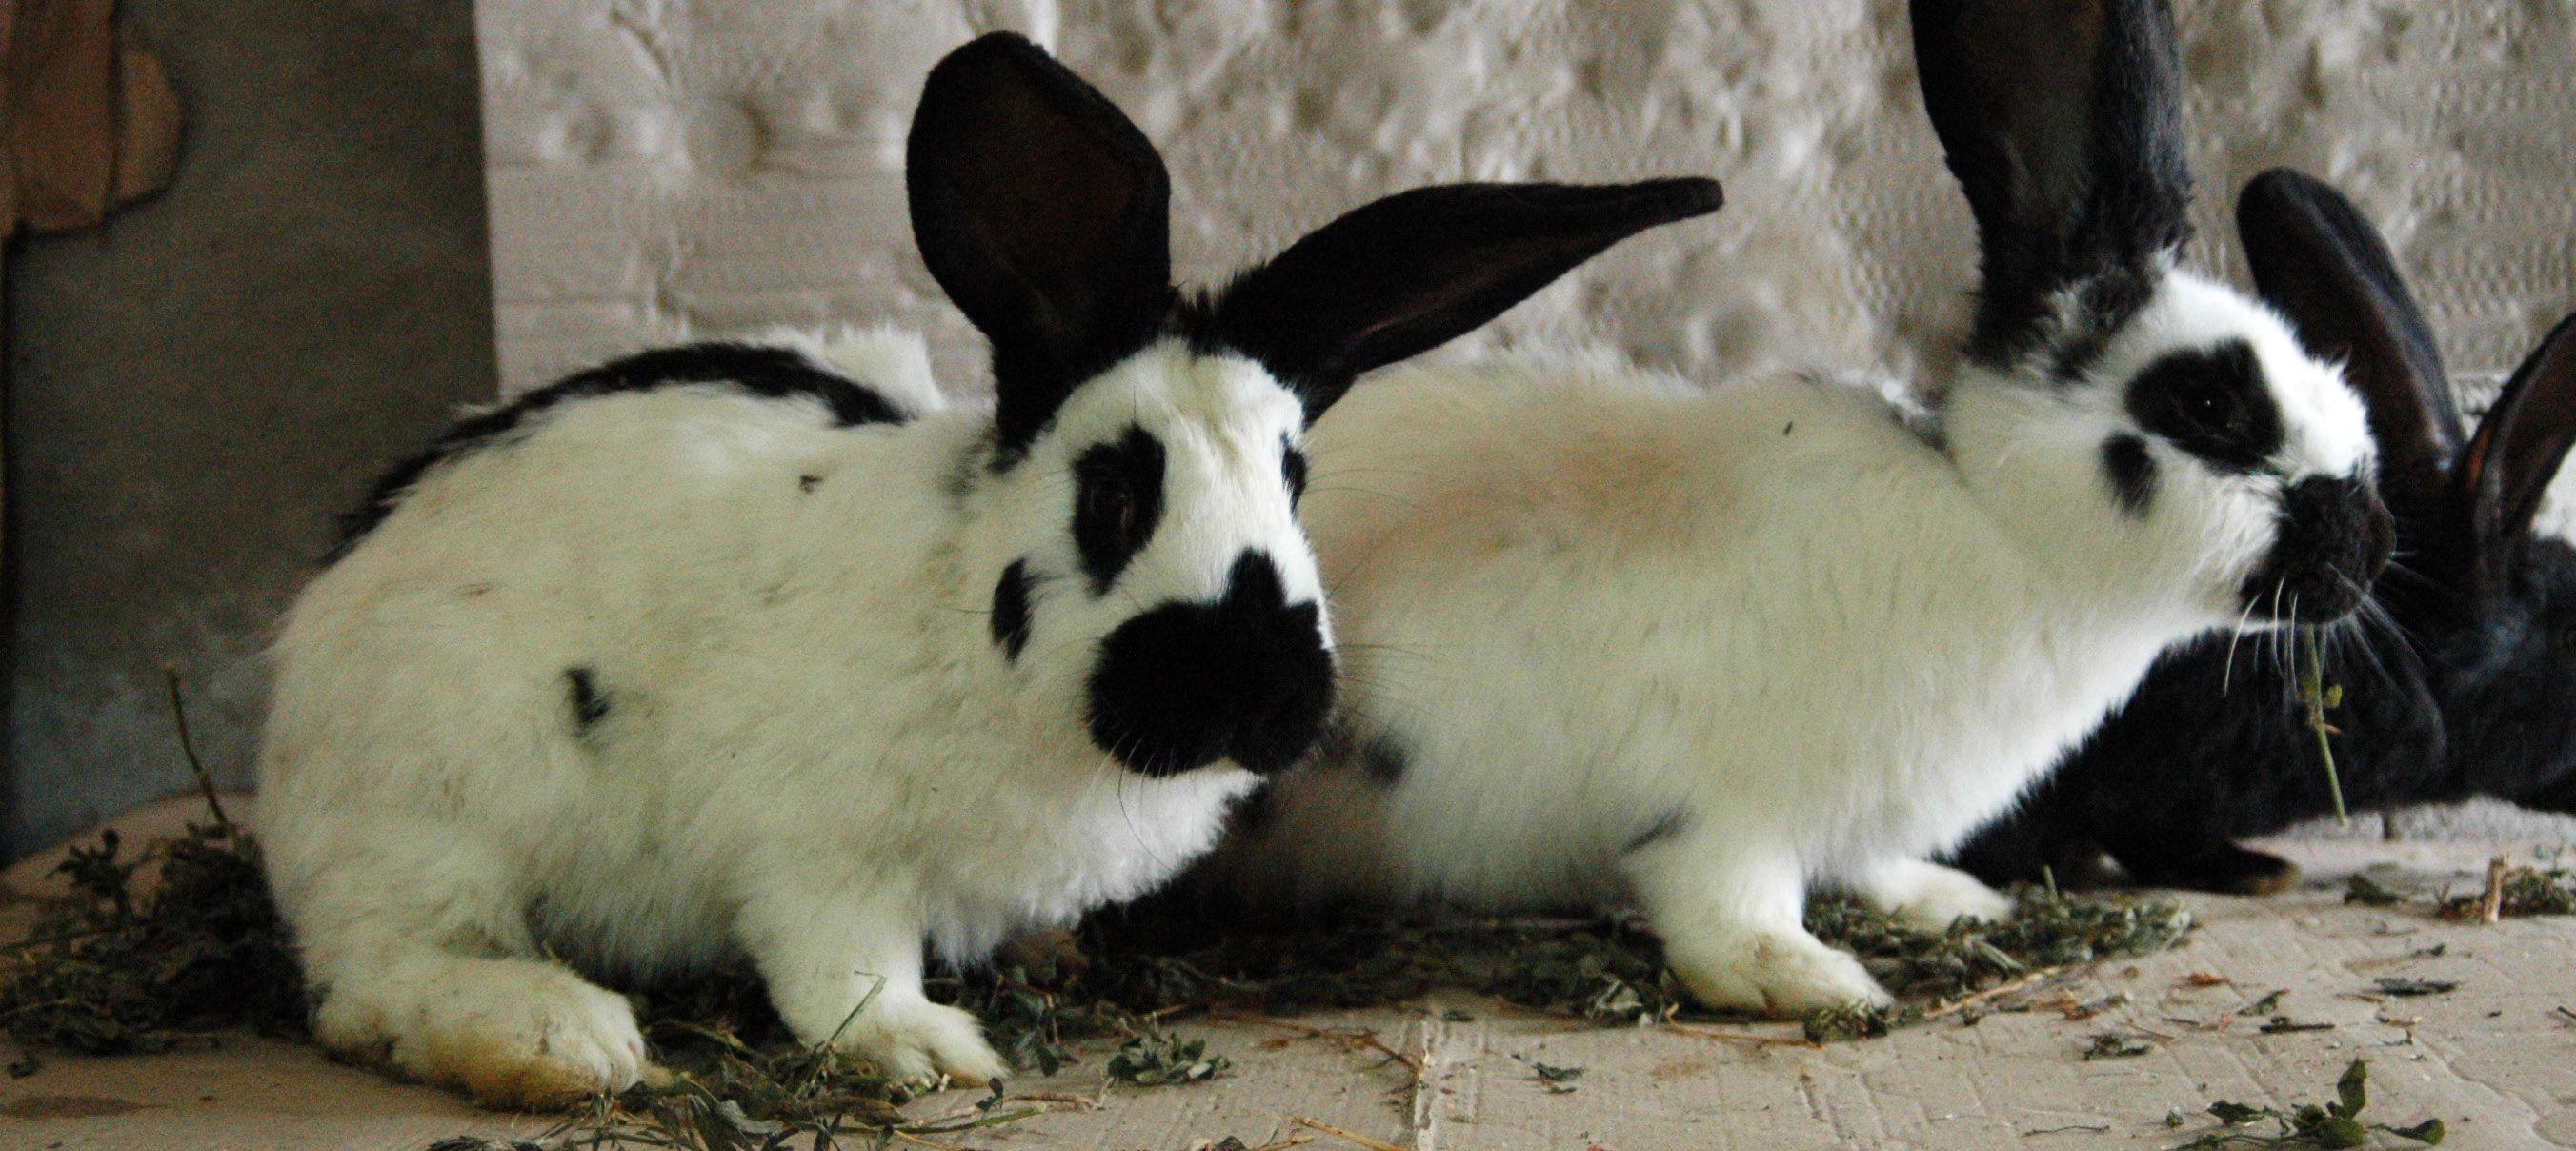 Diaree la iepuri: cauze principale, tratament și prevenire